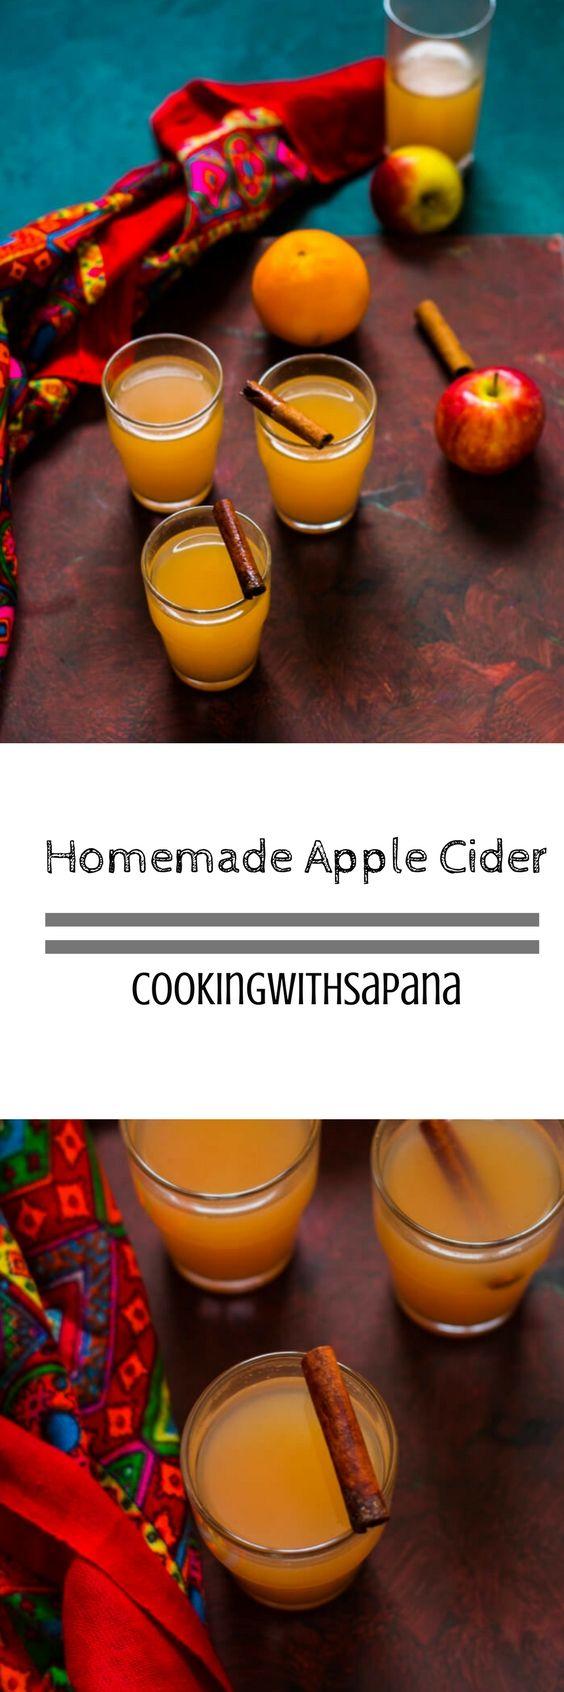 Homemade Apple Cider - CookingWithSapana